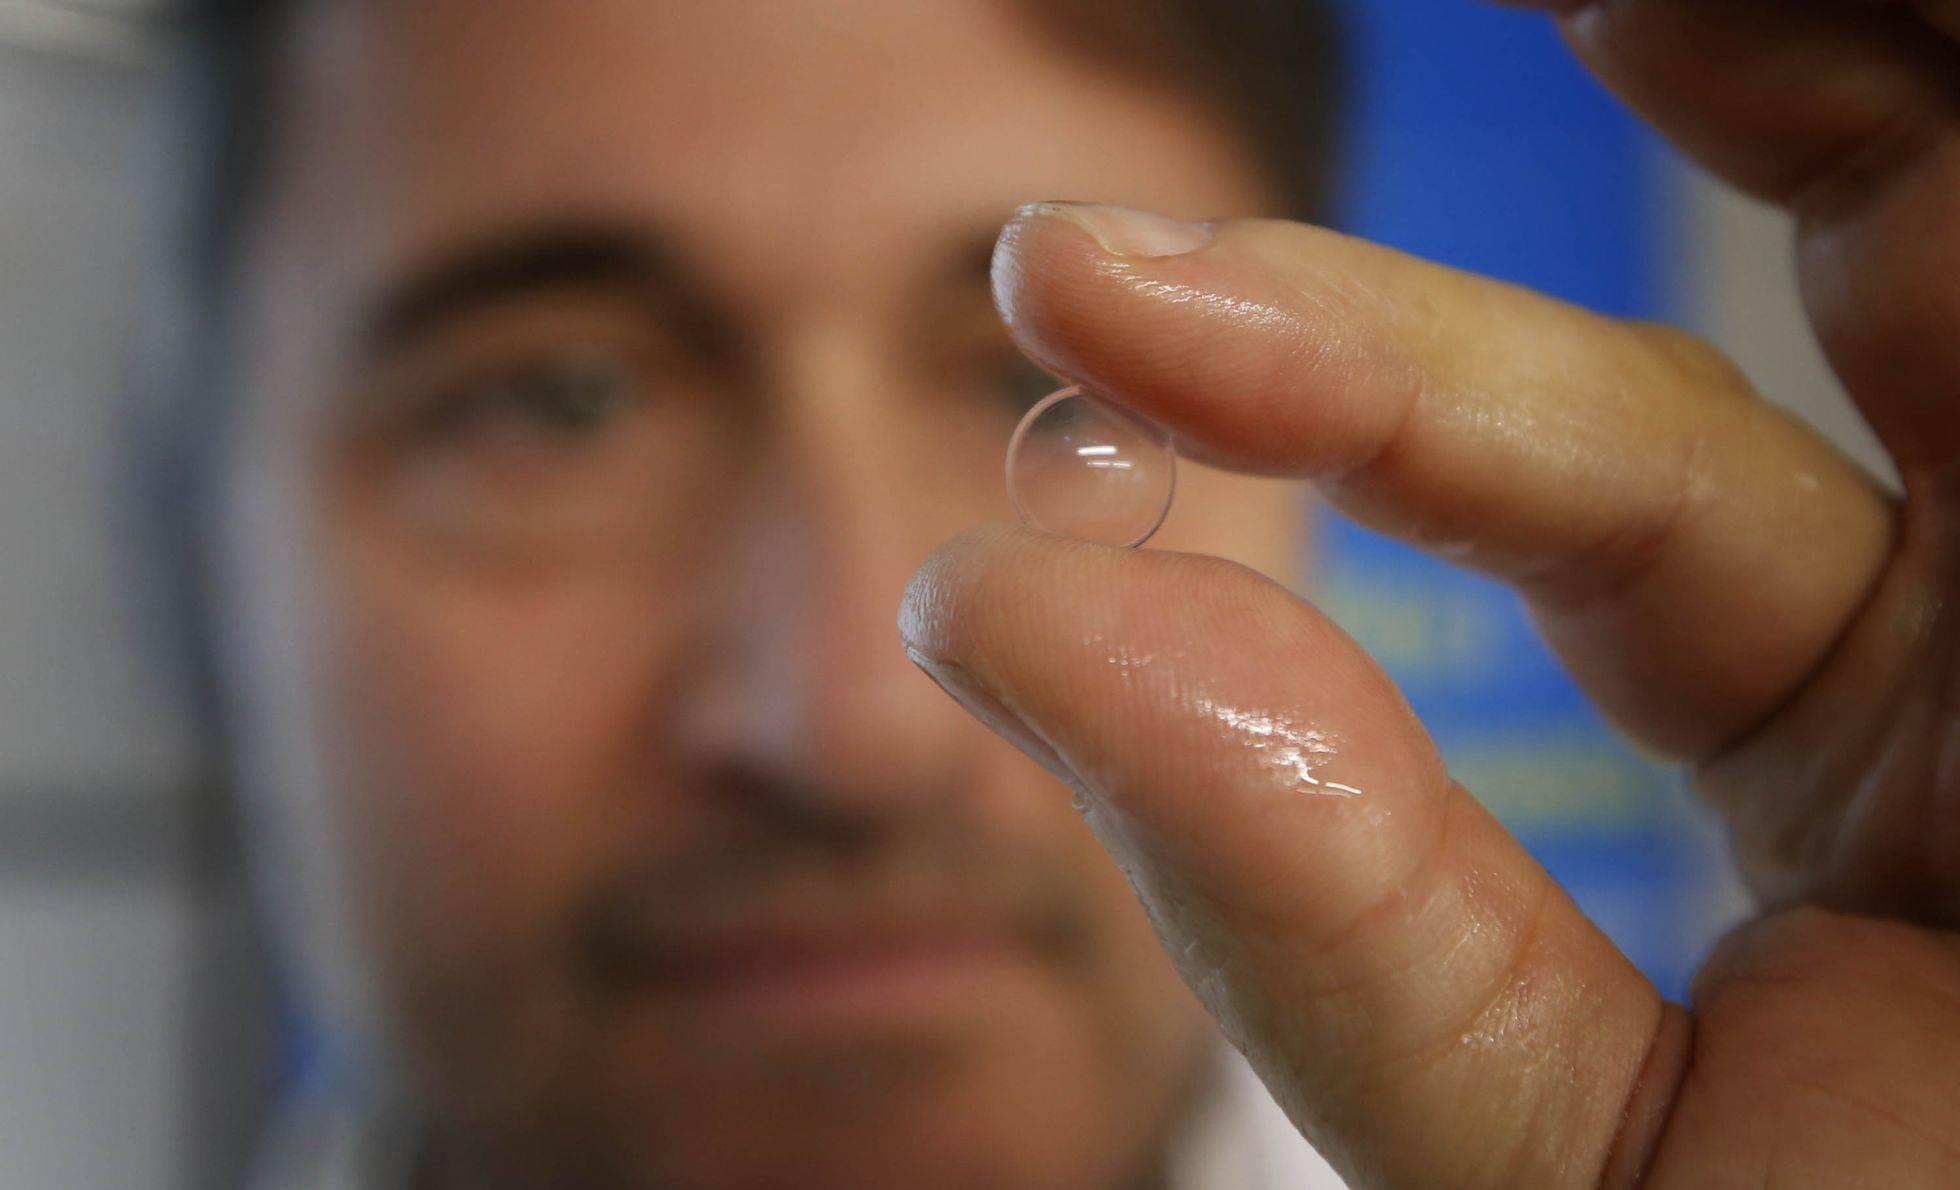 Lentilla progresiva frena hasta 43% evolución de miopía